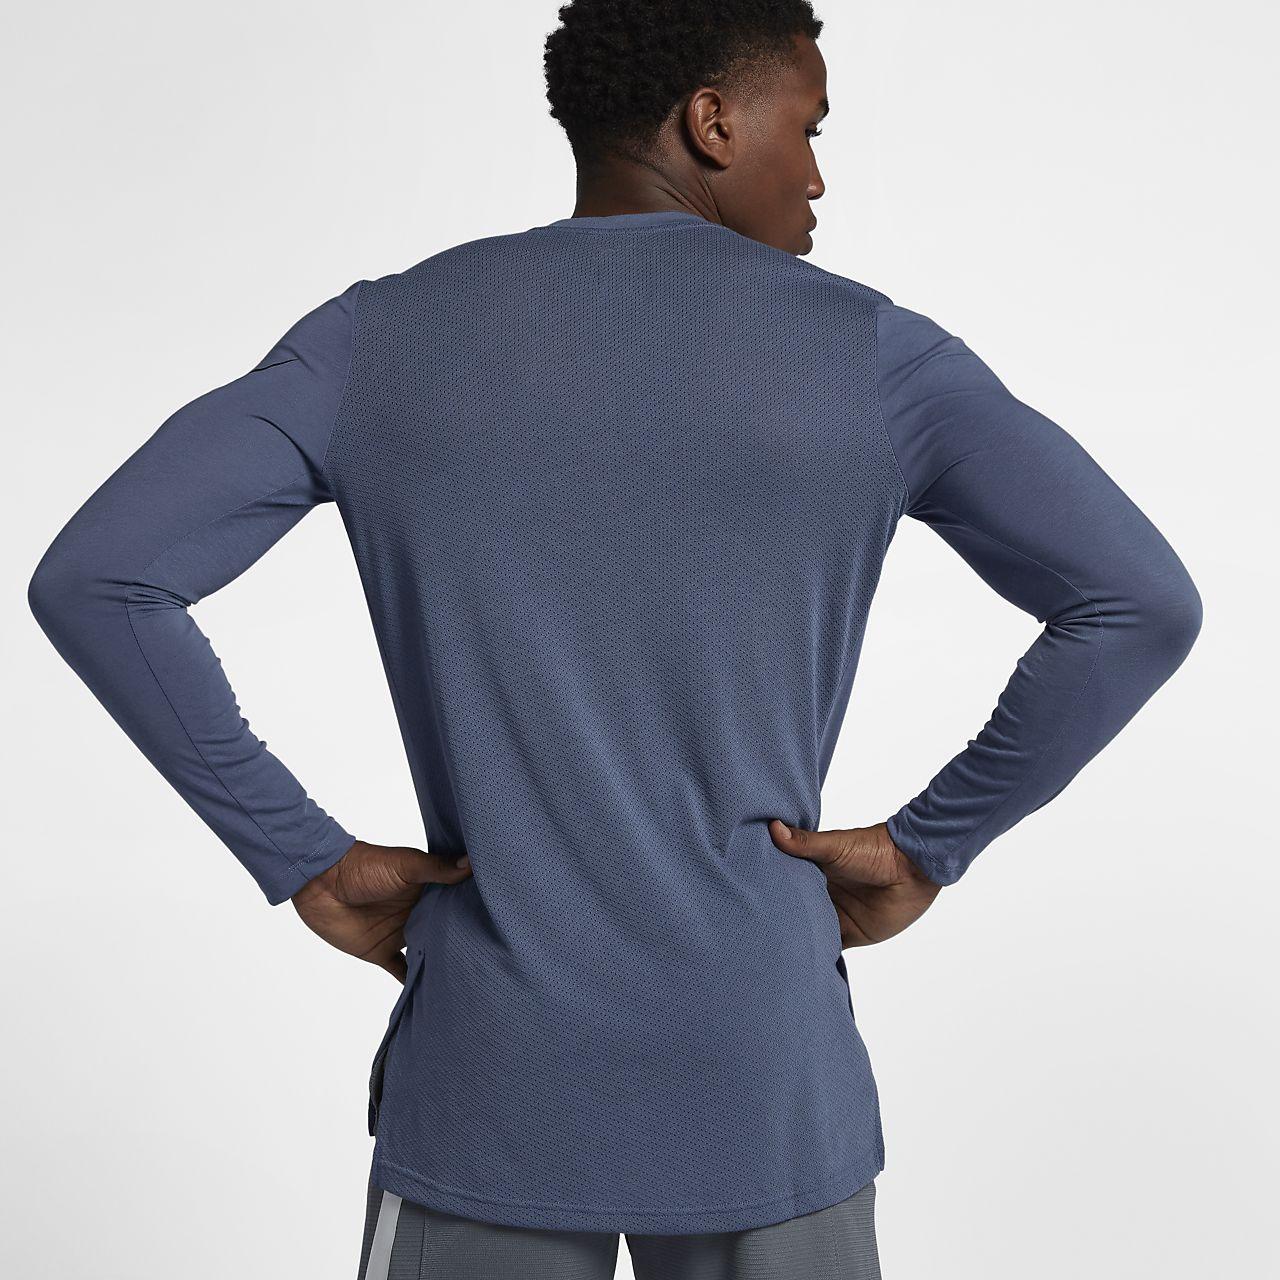 8e48d40015c6 Nike Breathe Elite Men s Long-Sleeve Basketball Top. Nike.com AU